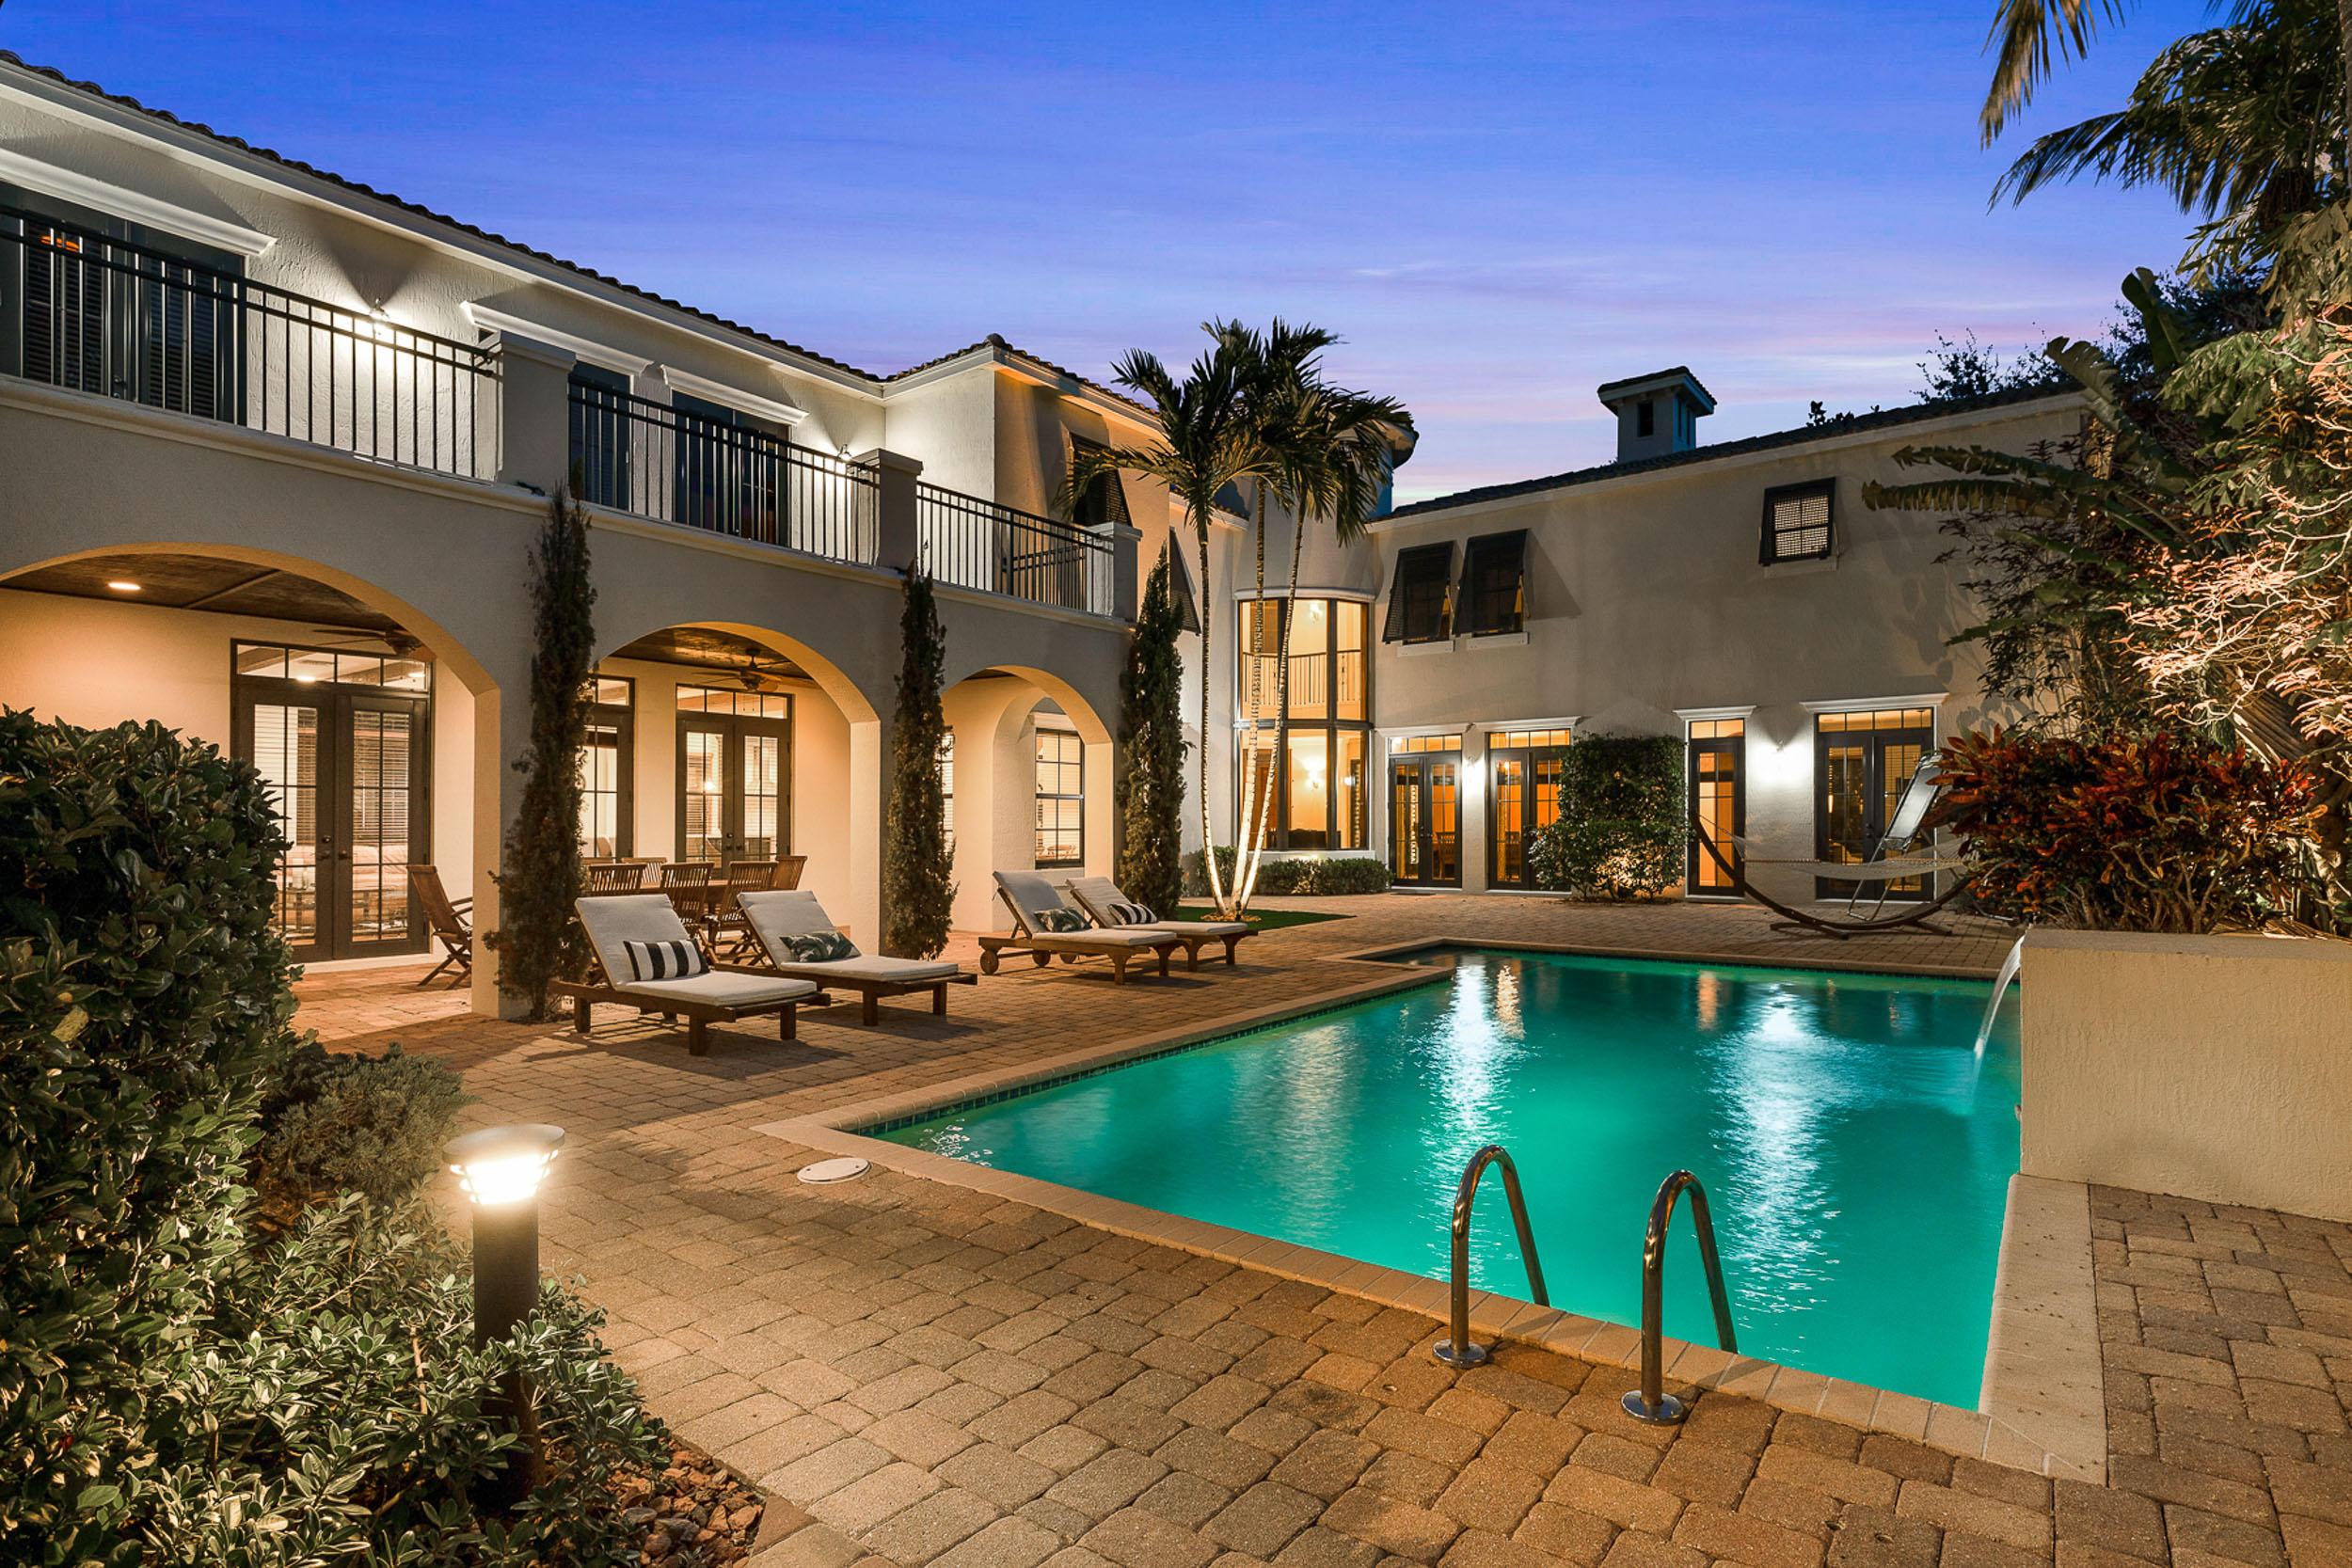 Private, spacious backyard